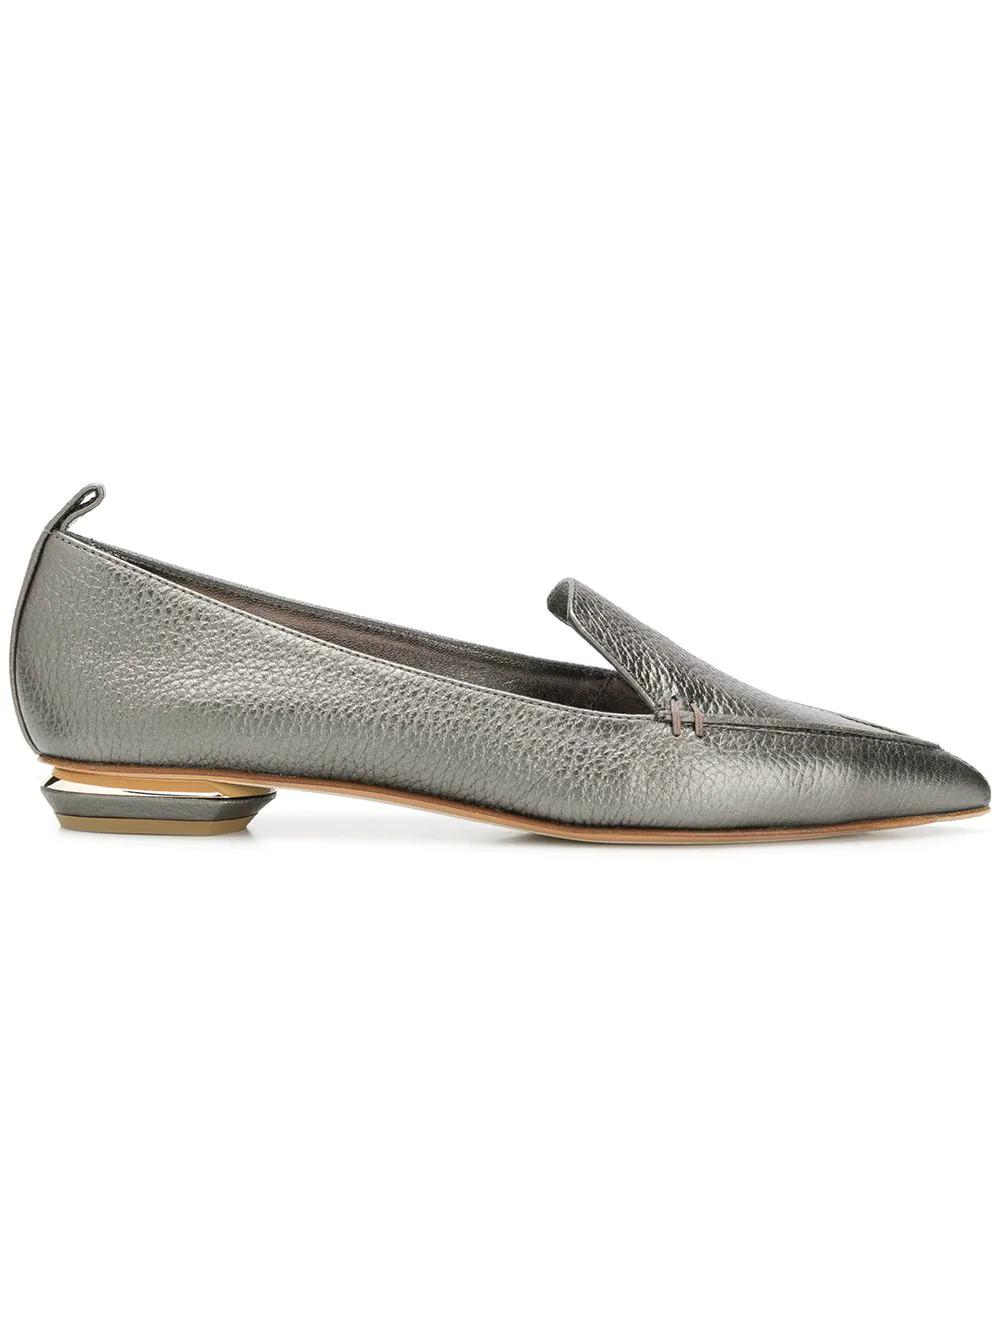 85c5c2de010b7e Nicholas Kirkwood Beya Black Tumbled Leather Loafer